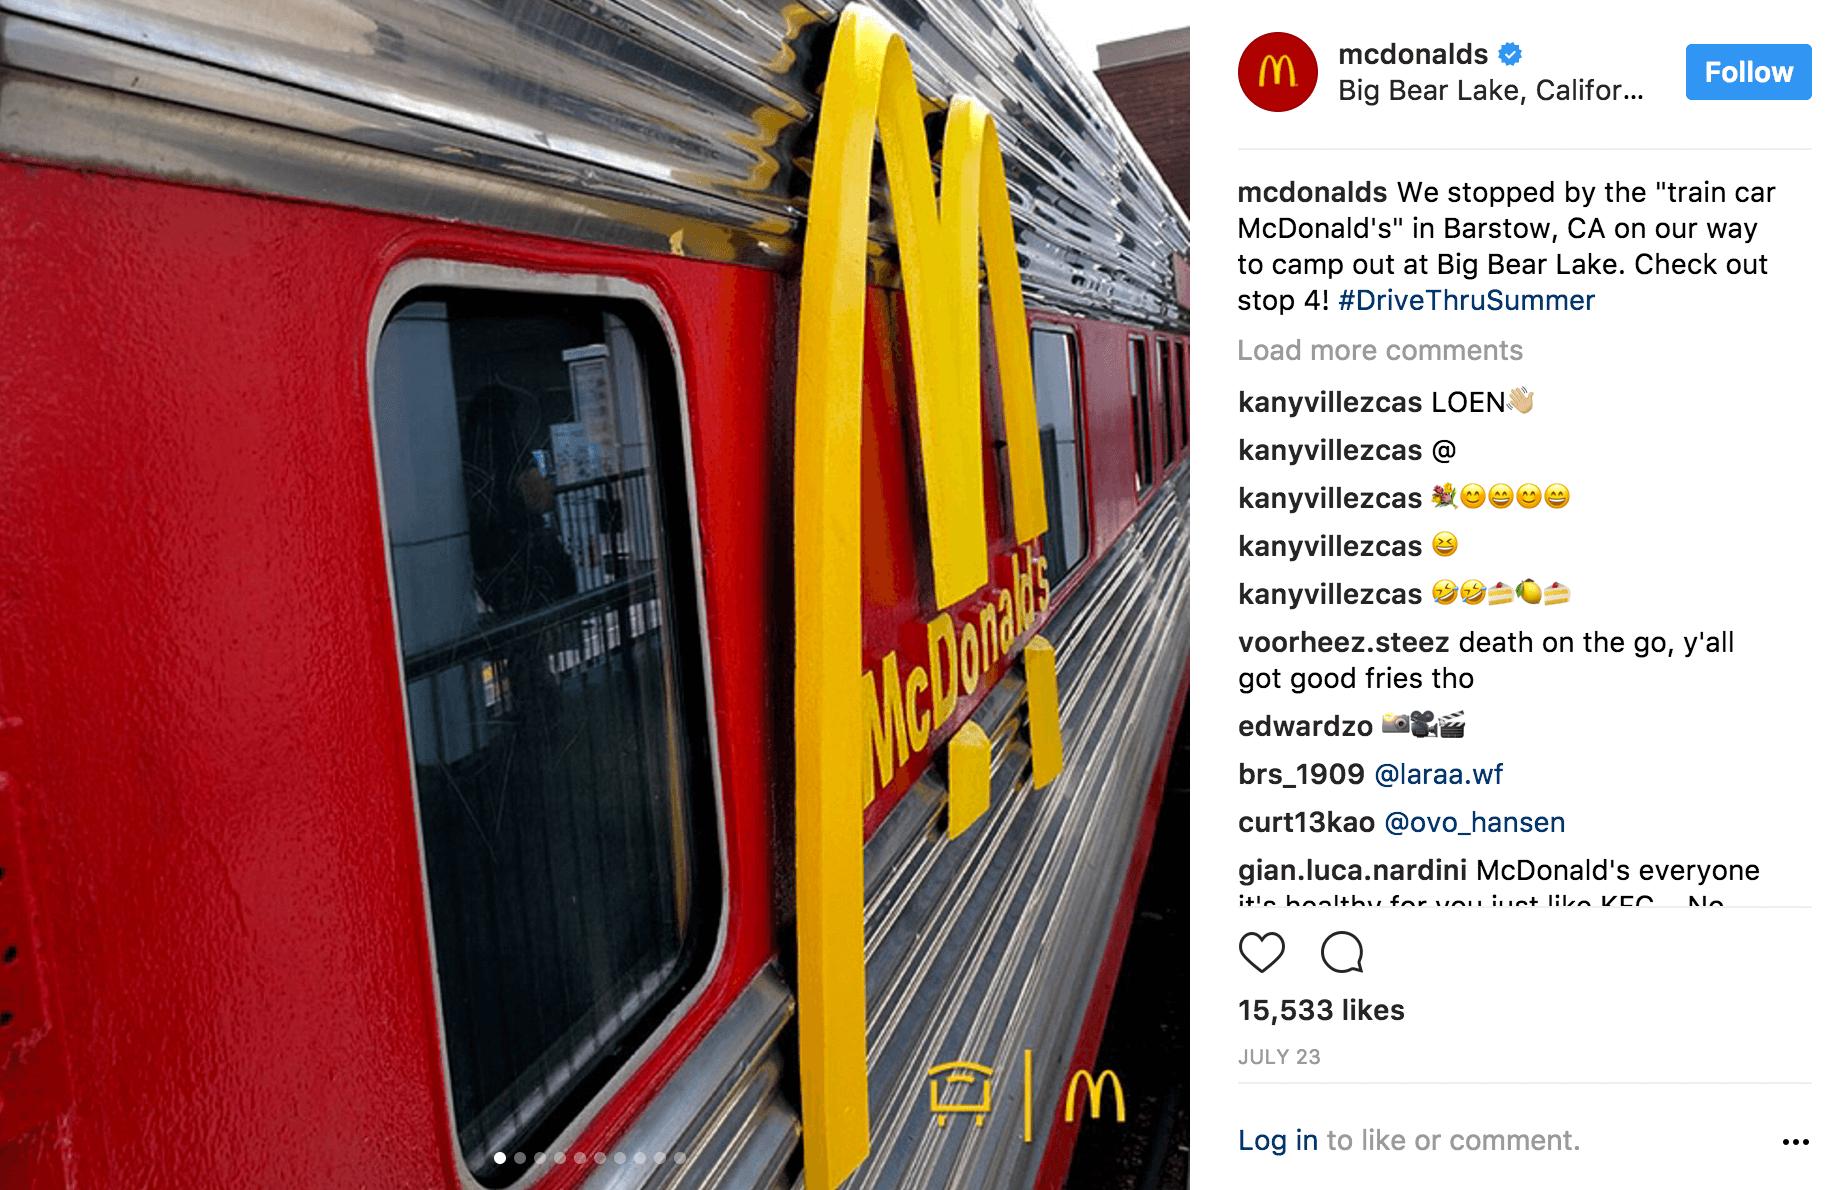 McDonalds Instagram